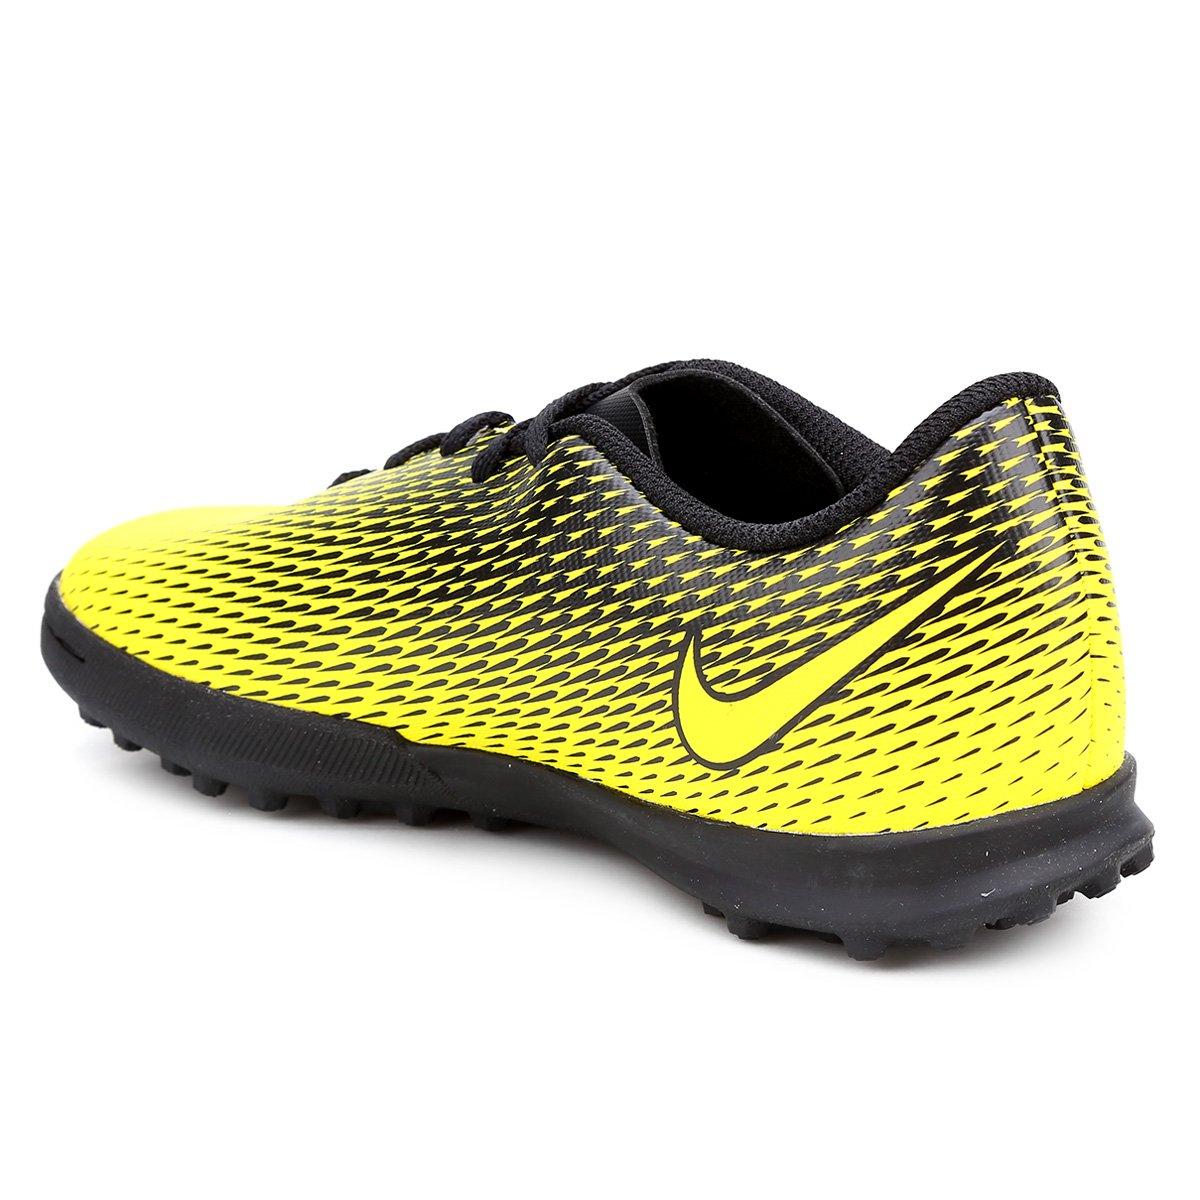 7d913ebac Chuteira Society Infantil Nike Bravata II TF - Tam: 36 - Shopping ...